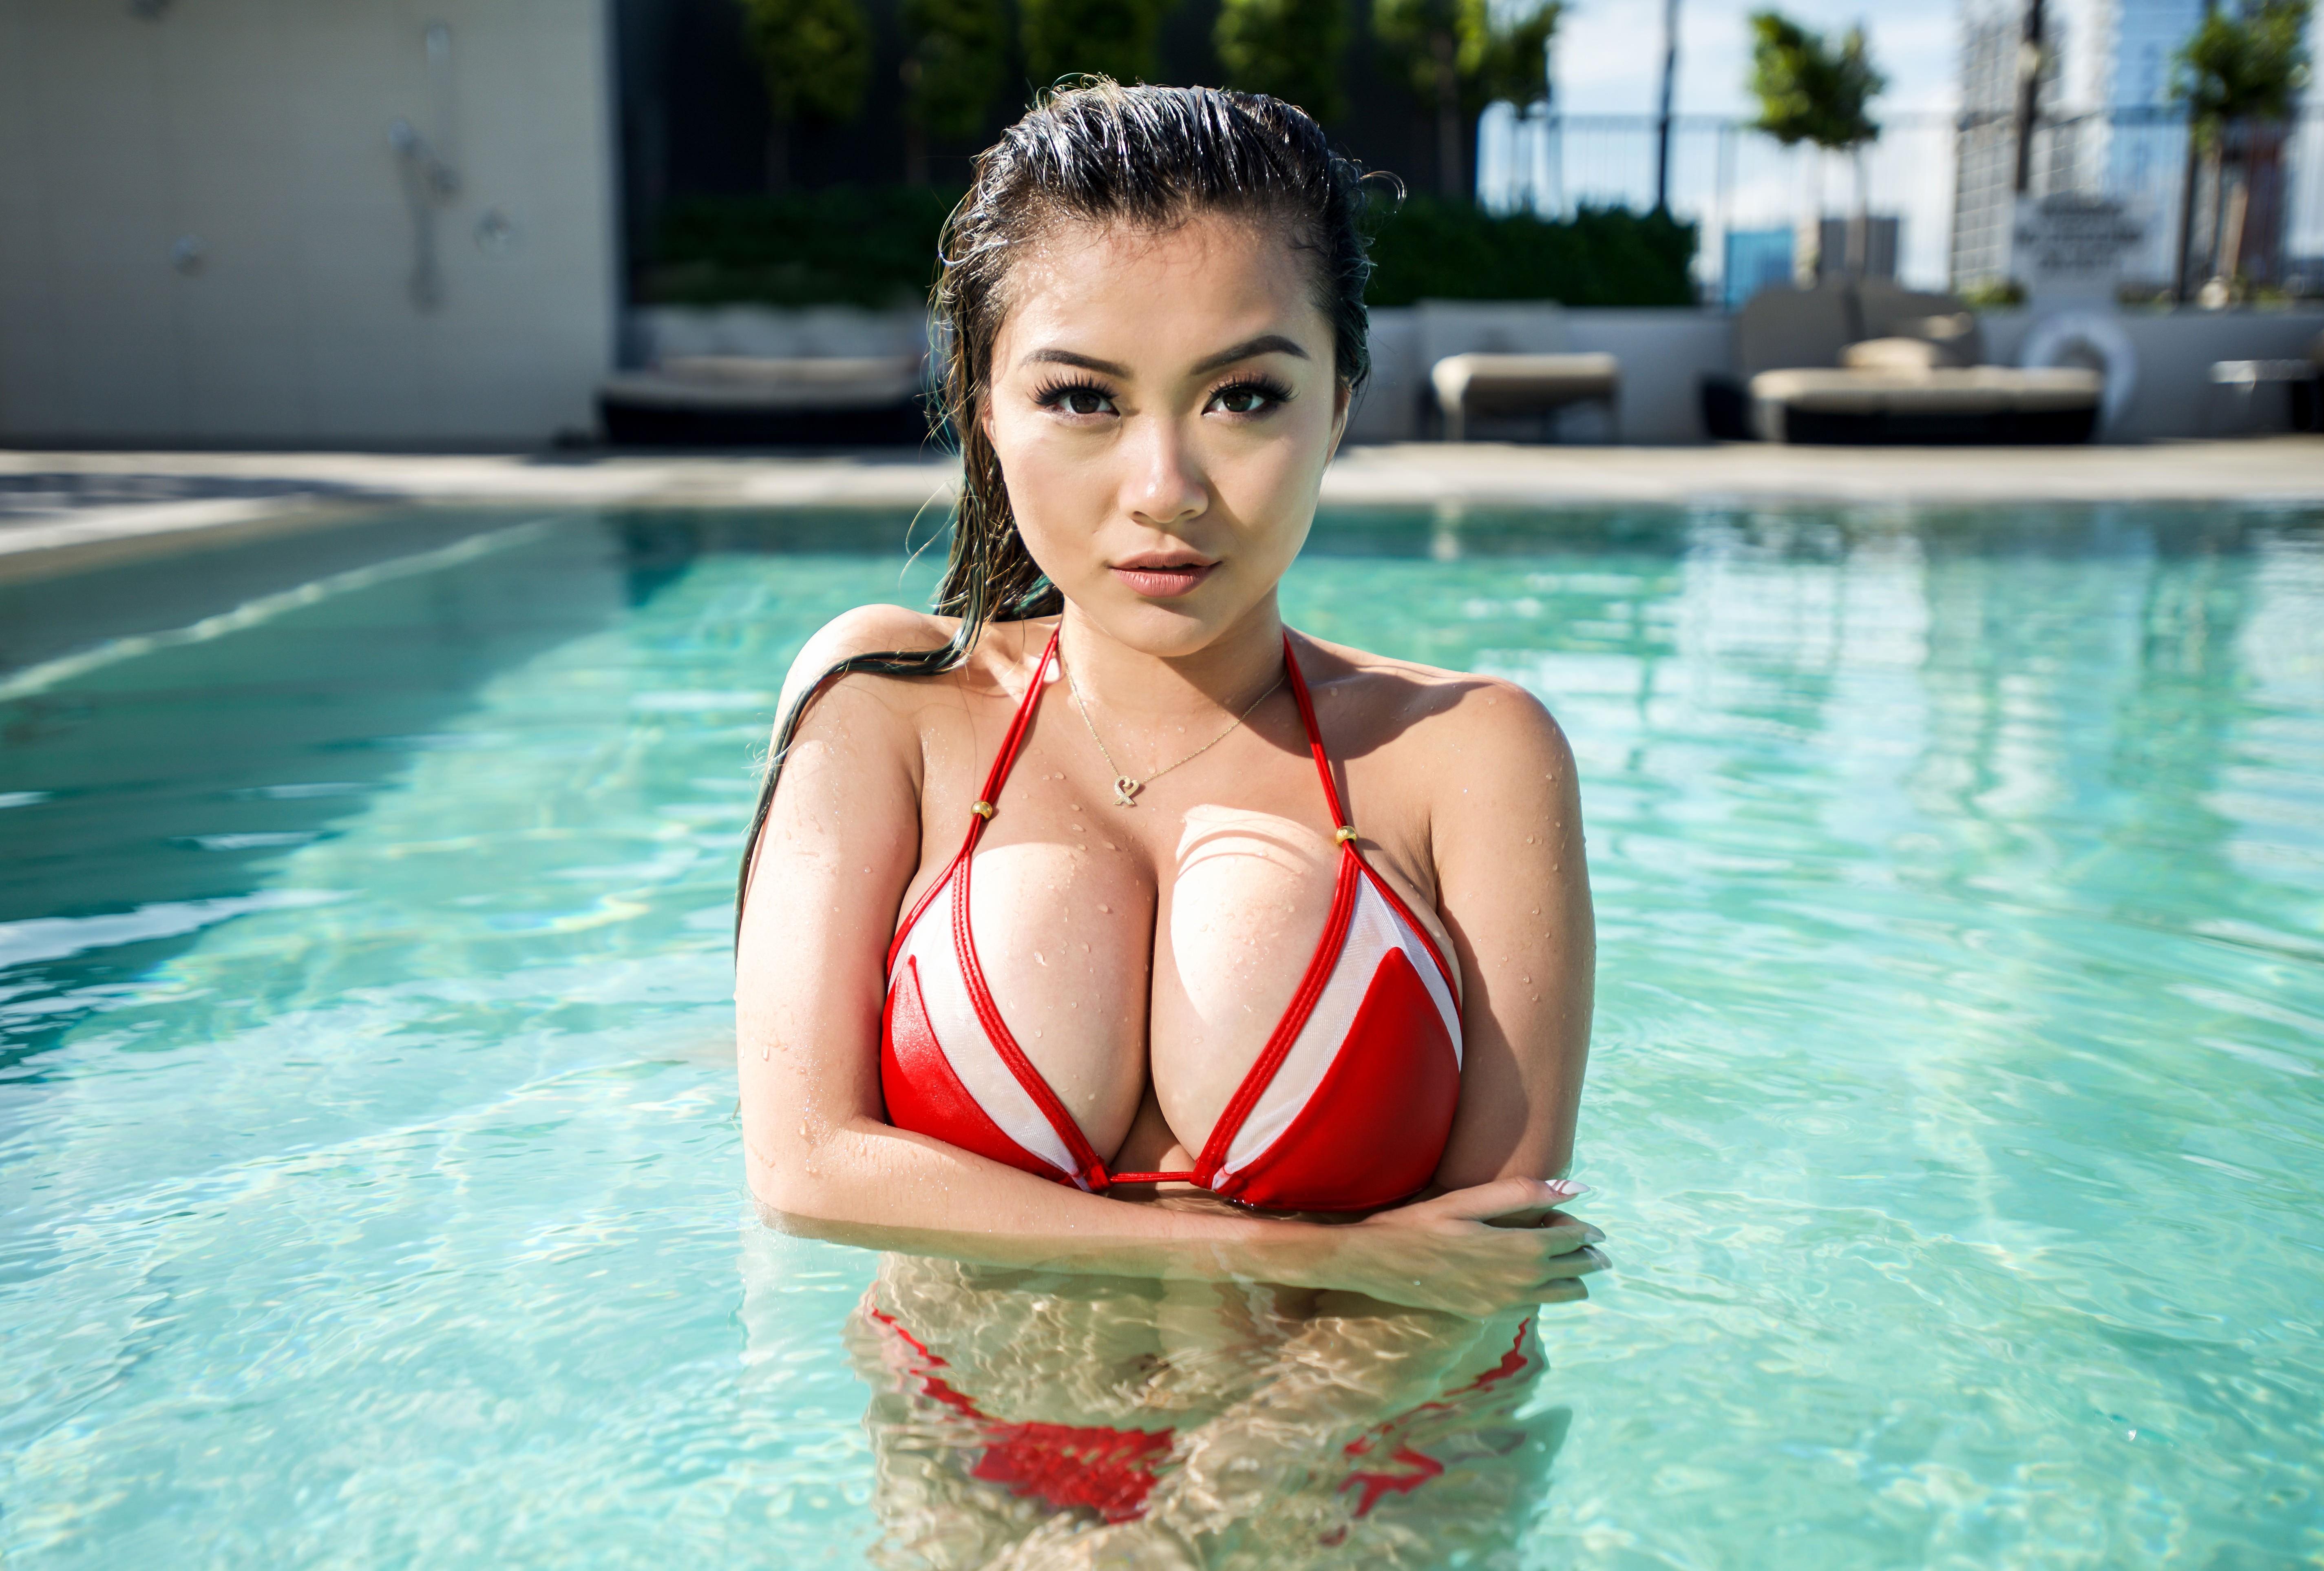 Free Playboy model Tube Videos at Brand Porno